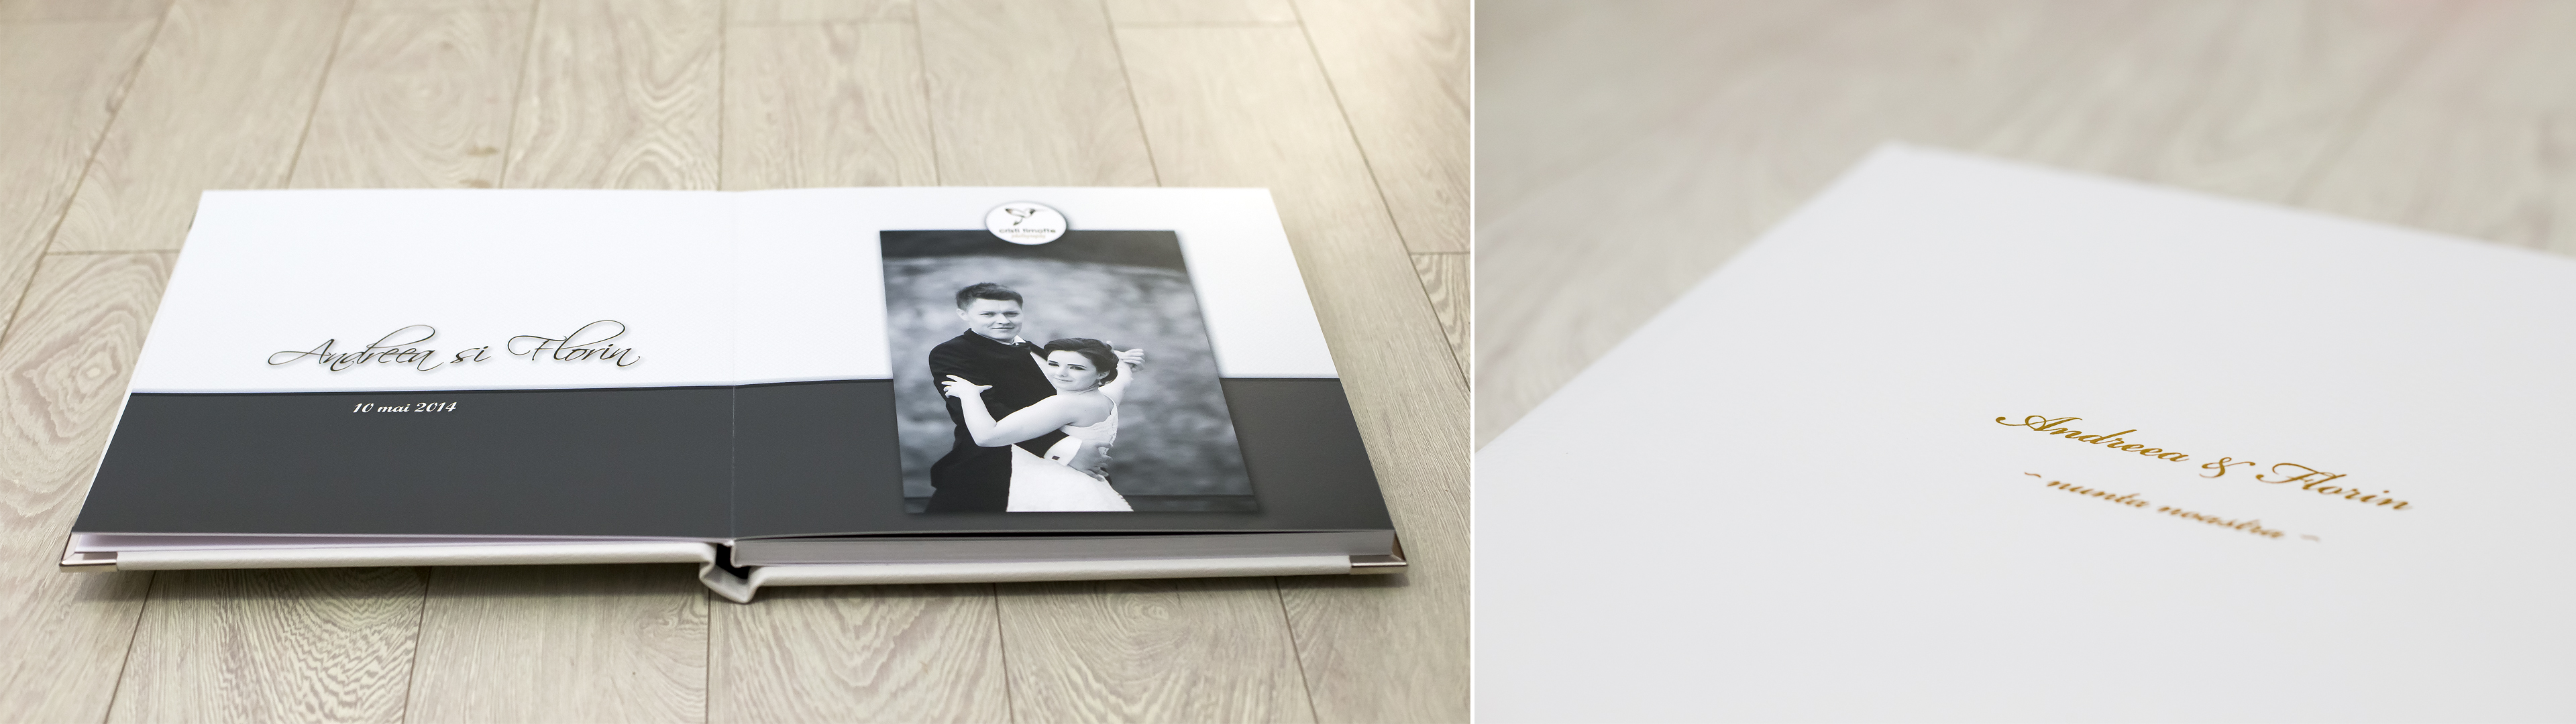 album fotocarte Andreea si Florin Soveja - 10.05.2014